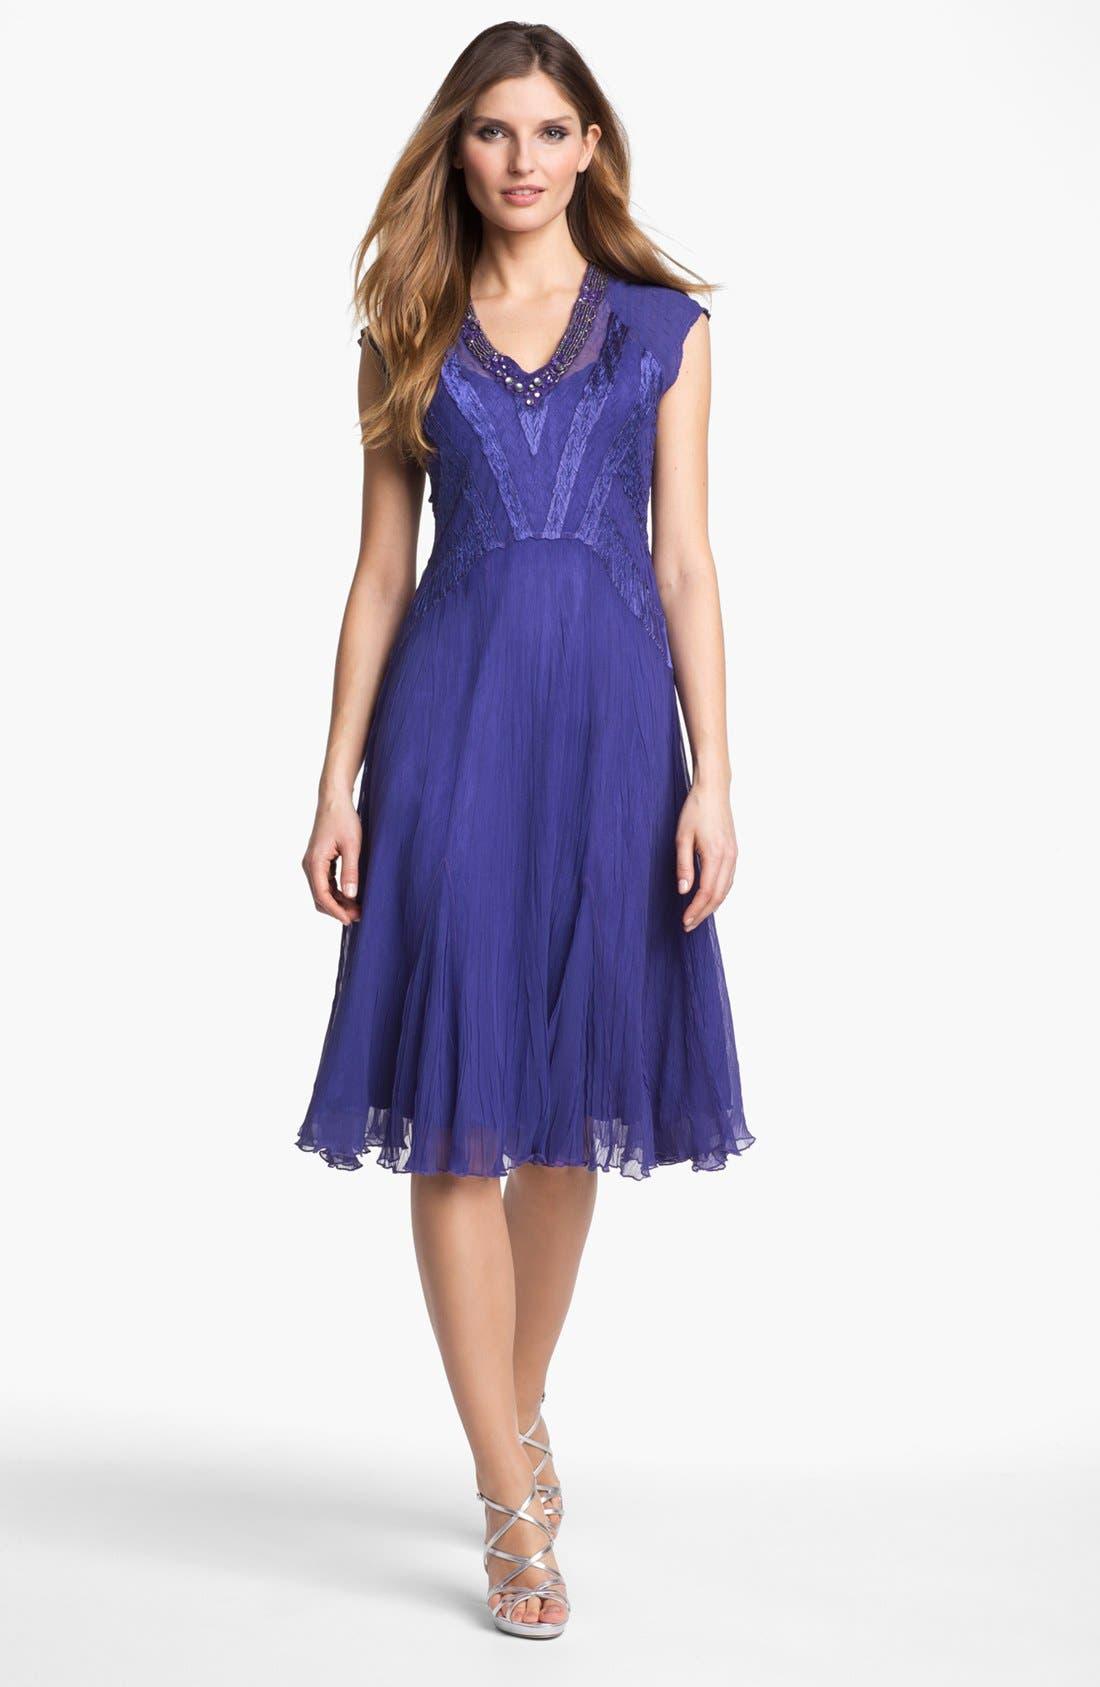 Alternate Image 1 Selected - Komarov Embellished Textured Chiffon Dress